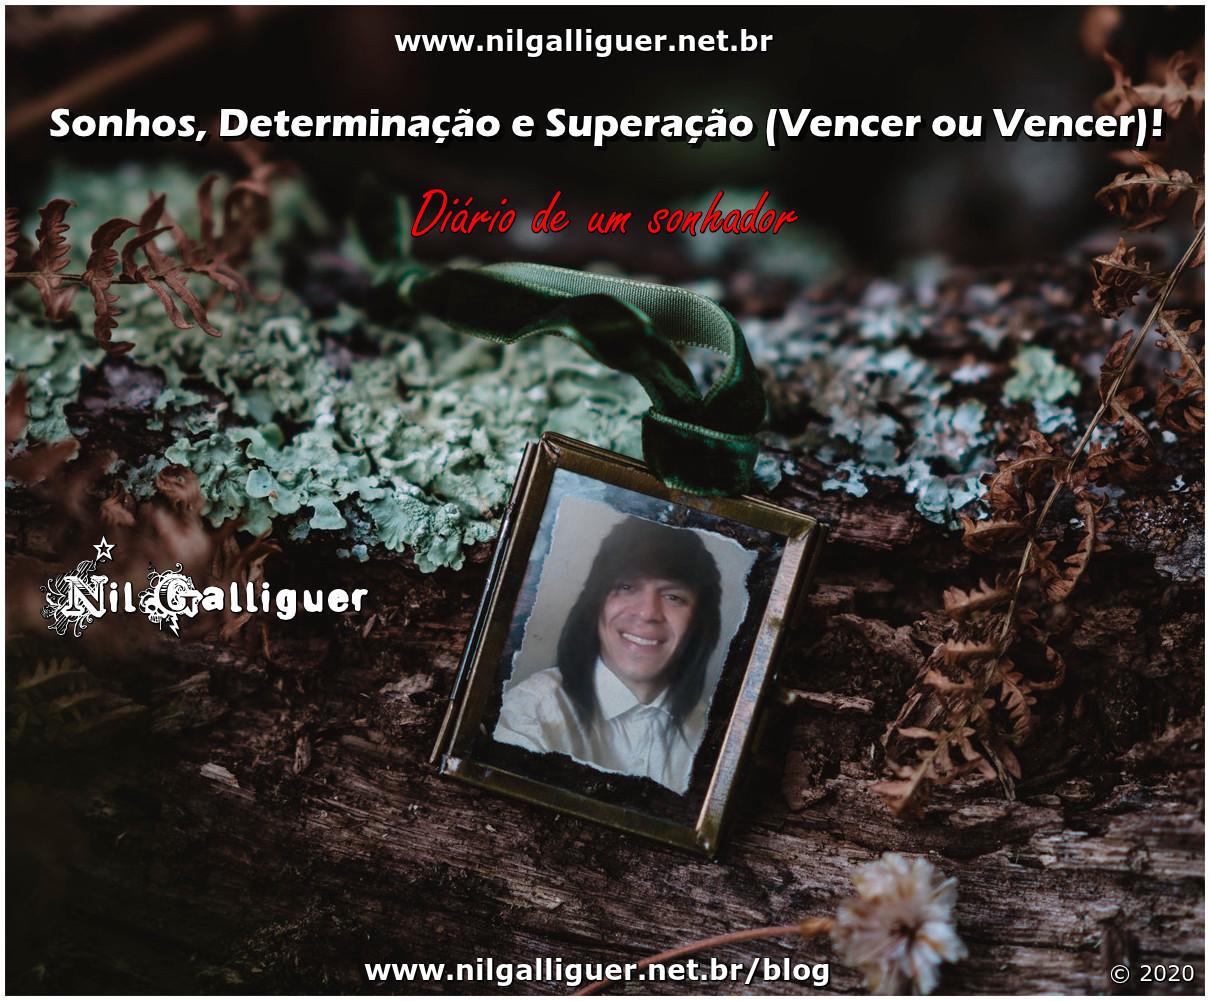 Nil Galliguer , BLOG, 20-01-2020